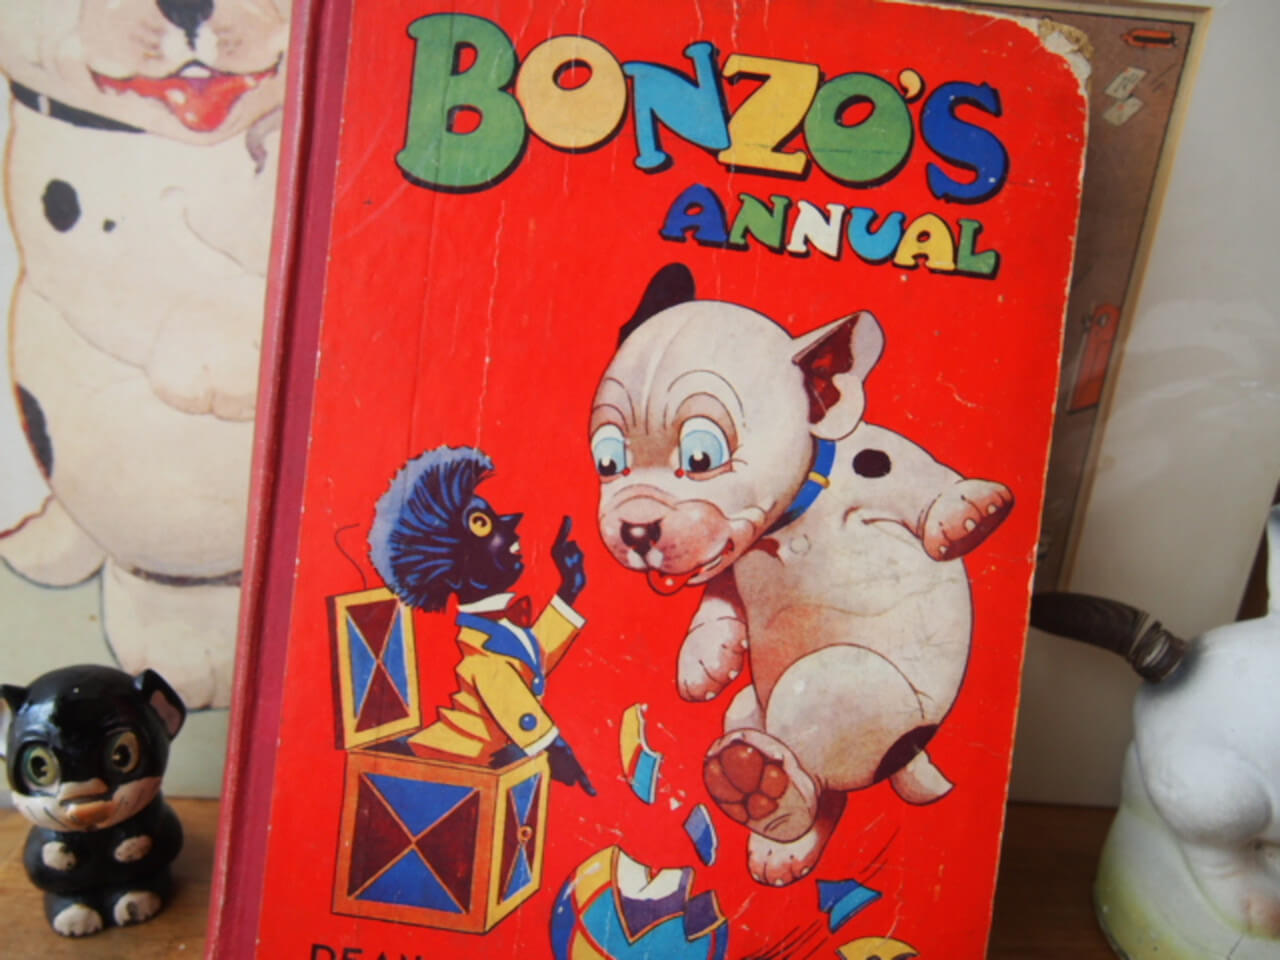 BONZO(絵本)